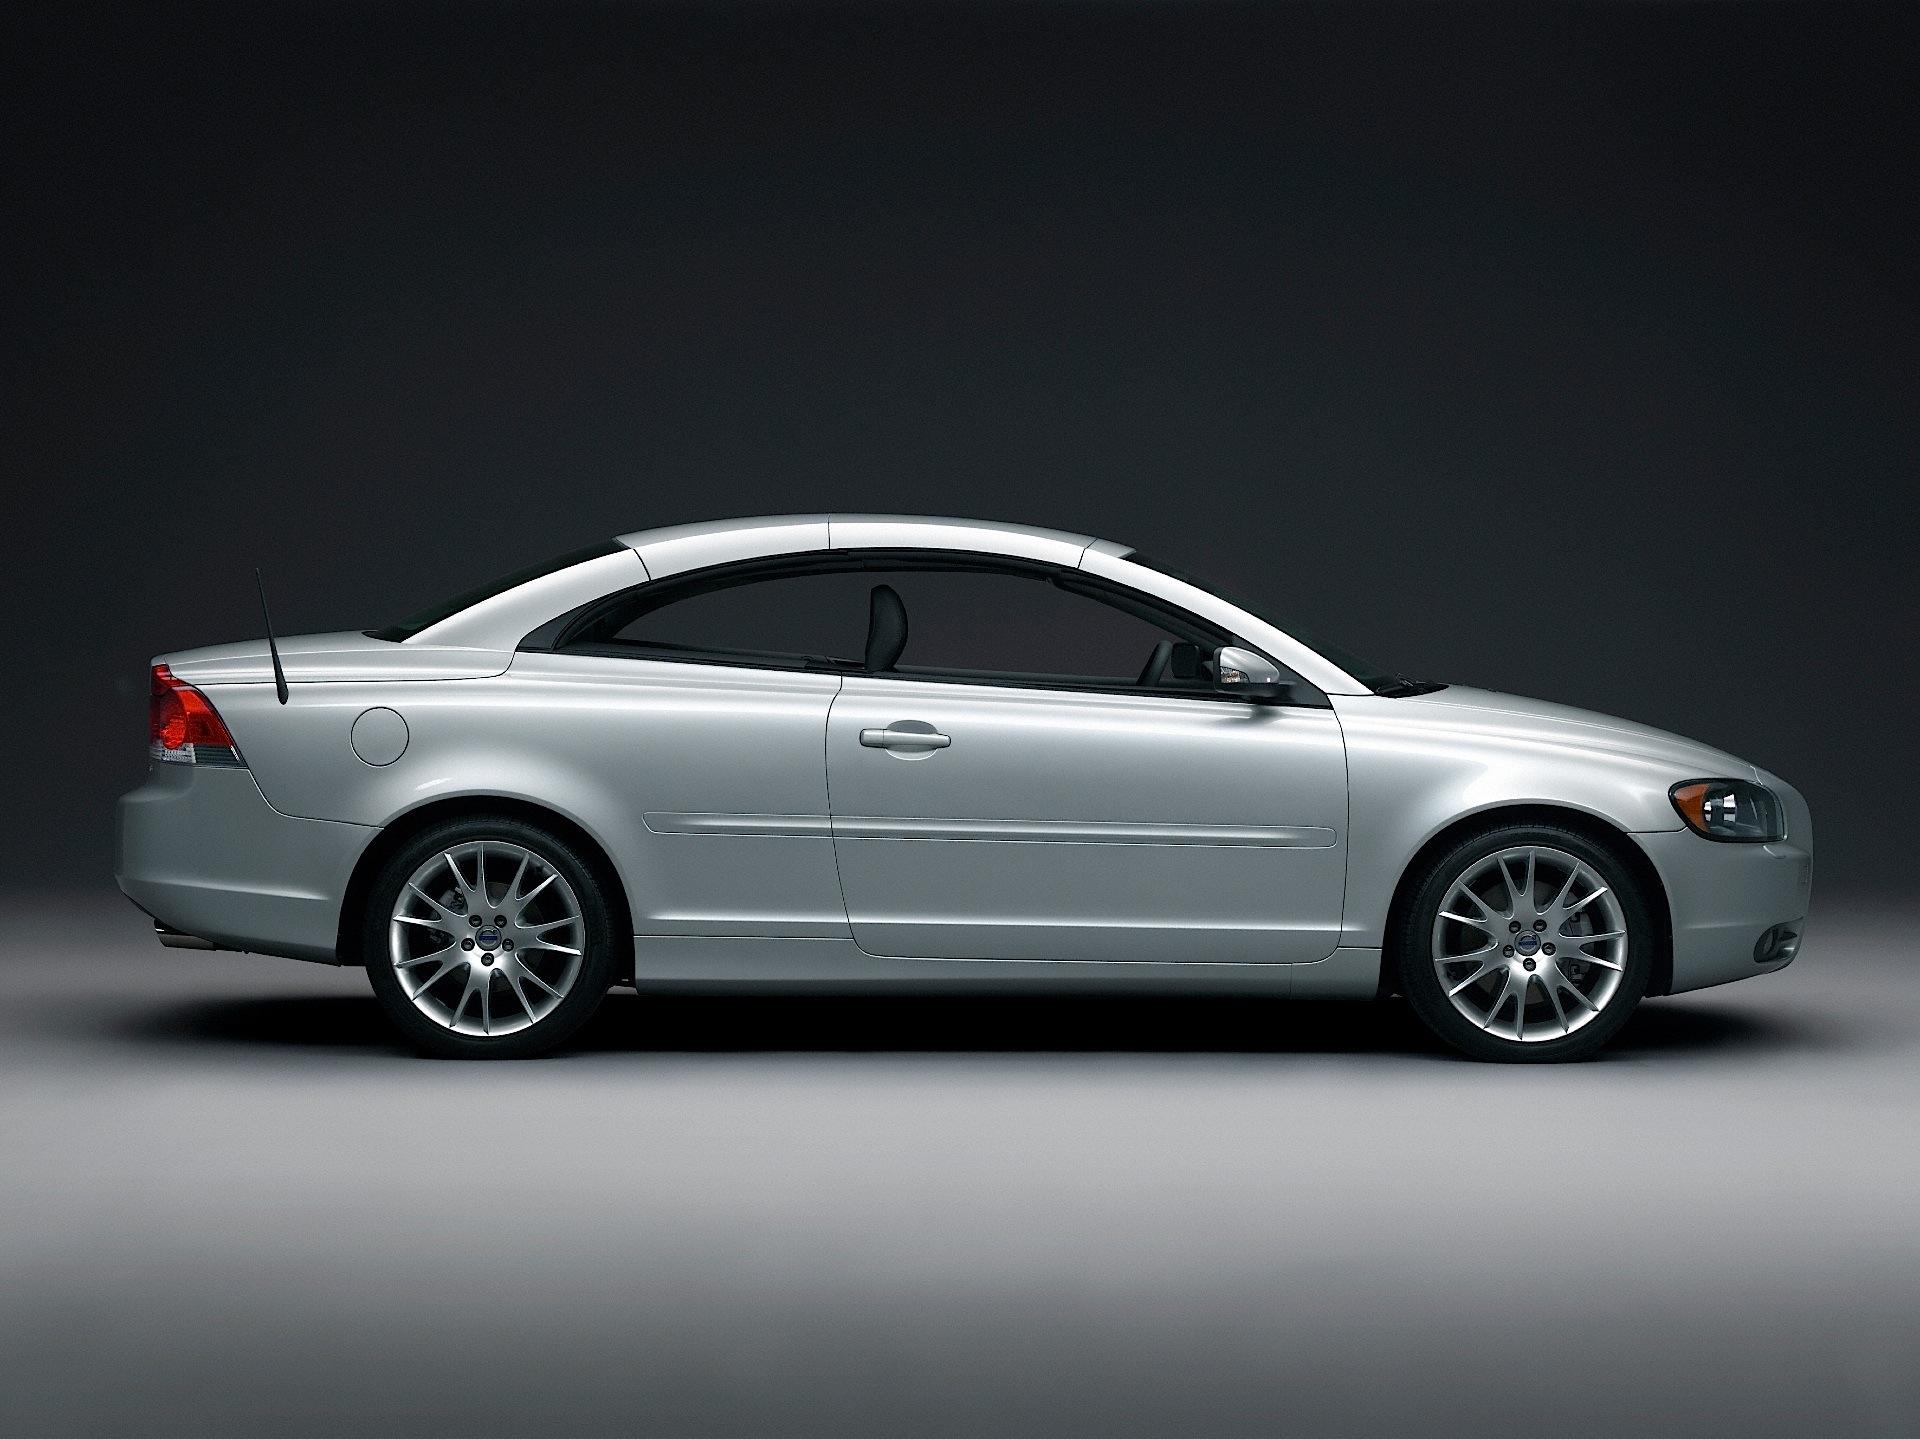 2005 Volvo C70 Convertible >> VOLVO C70 specs - 2005, 2006, 2007, 2008, 2009, 2010, 2011, 2012, 2013 - autoevolution